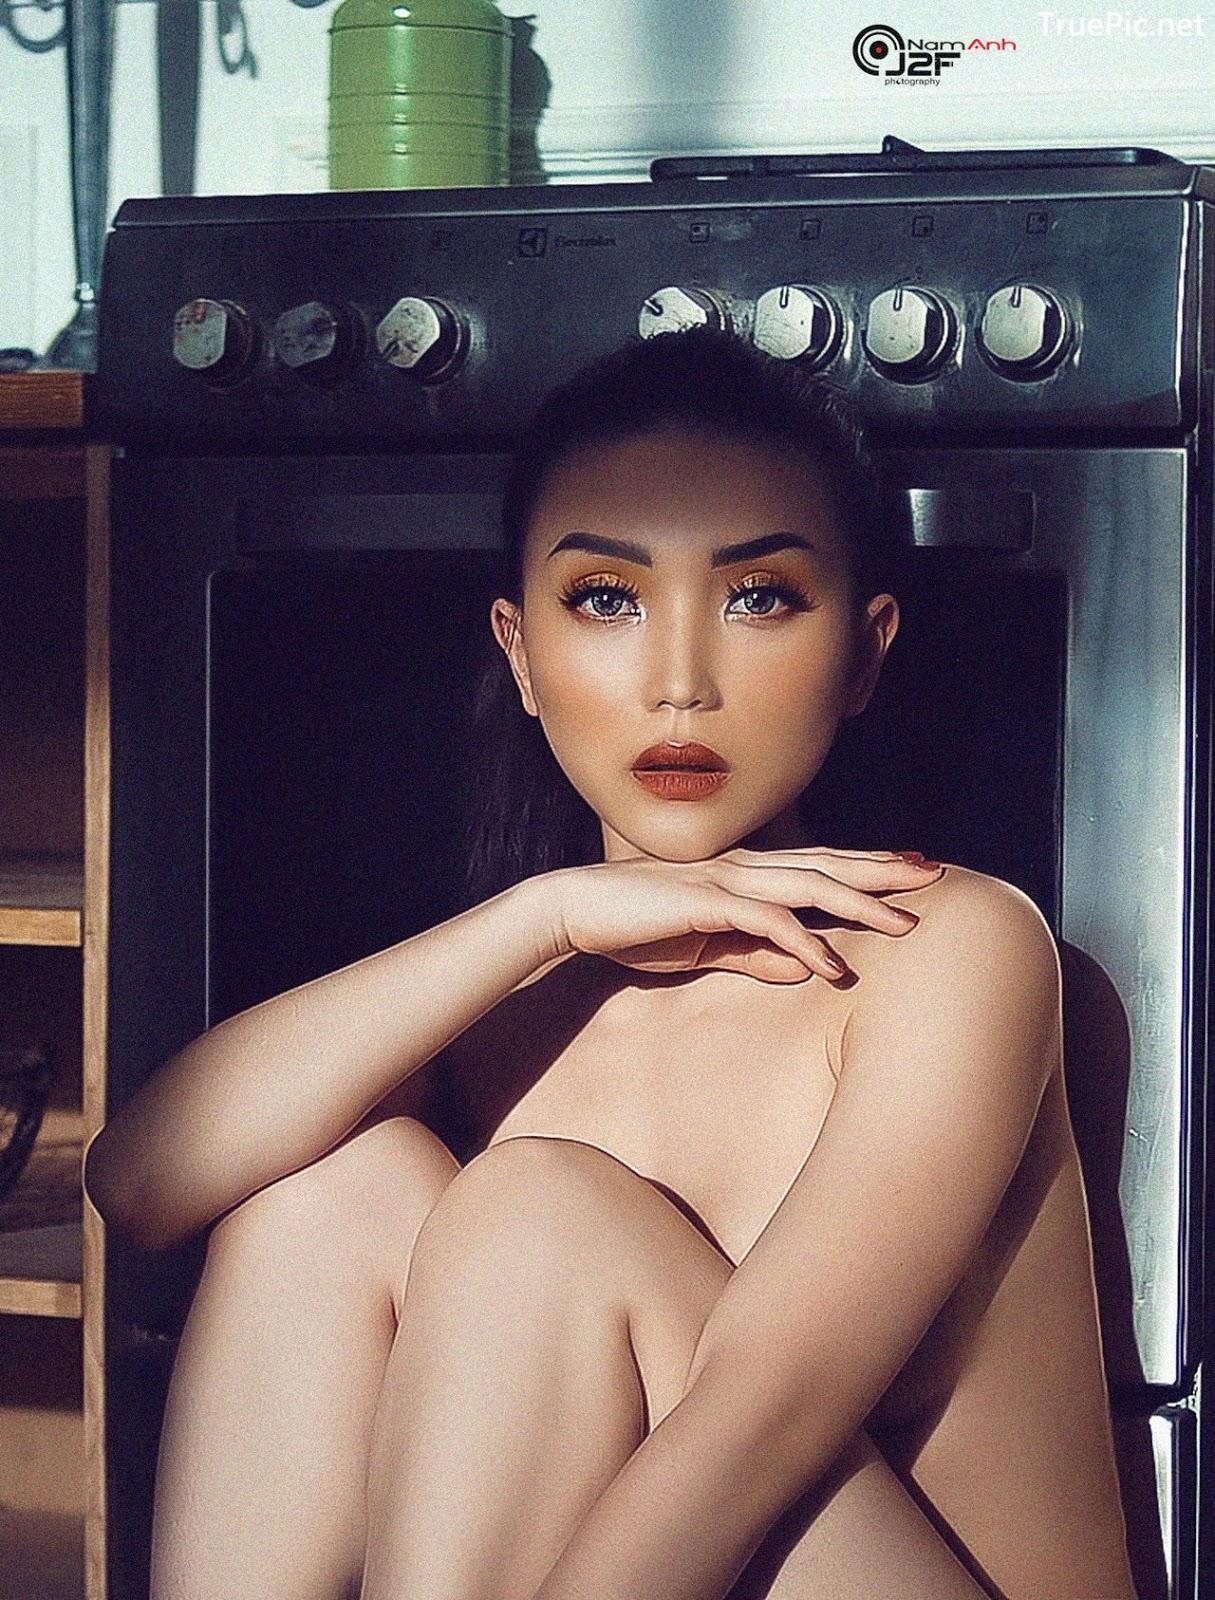 Image Vietnamese Model – Sexy Beauty of Beautiful Girls Taken by NamAnh Photo #7 - TruePic.net - Picture-17